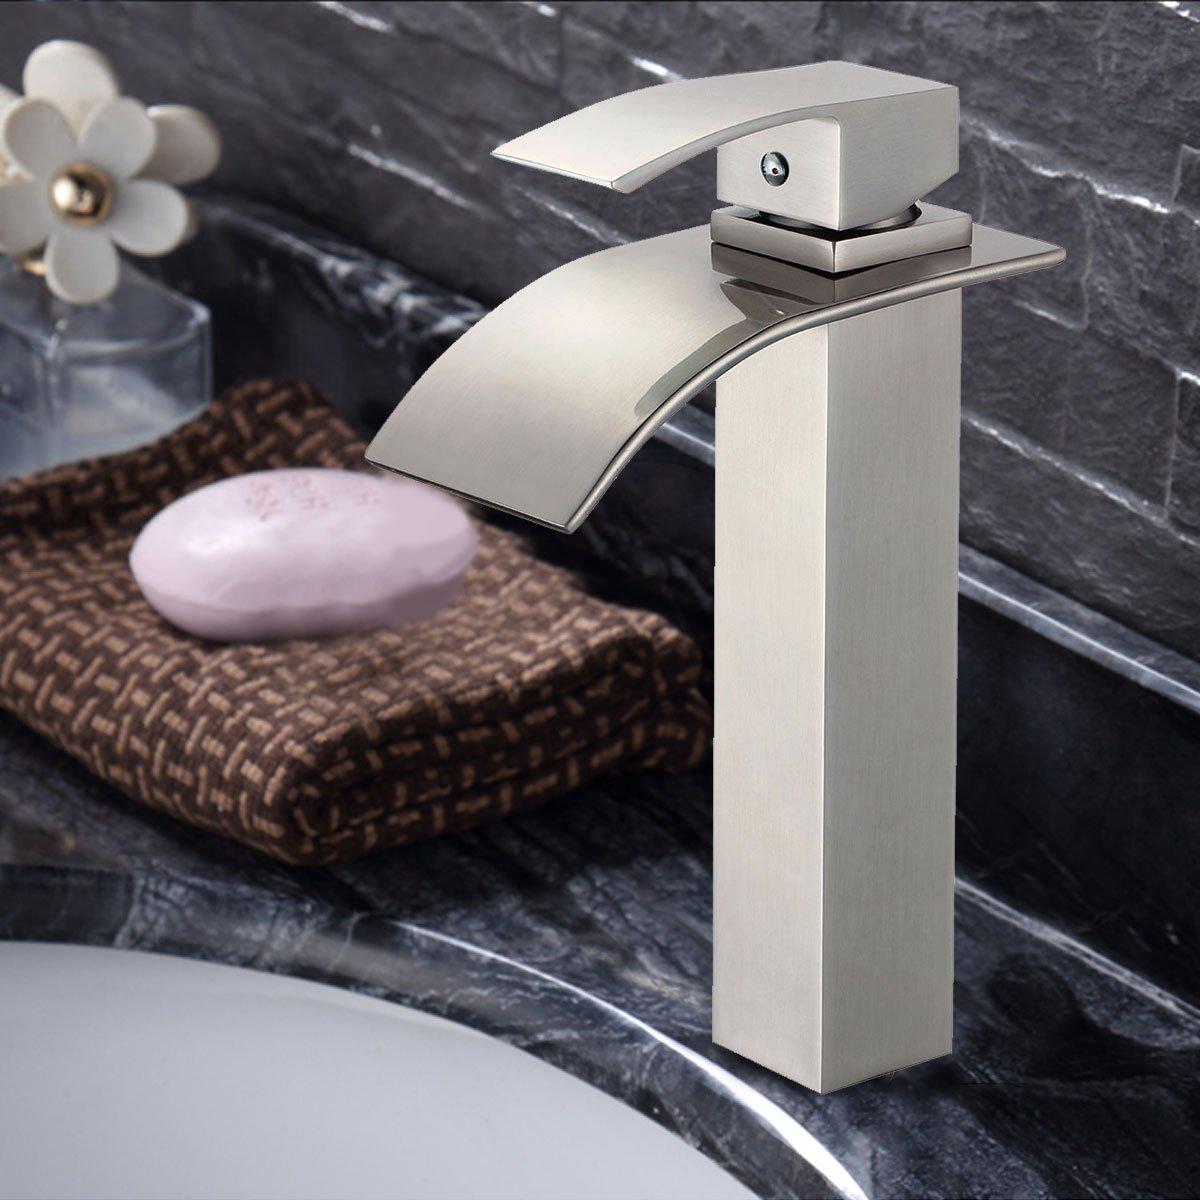 Basin&Sink Waterfall Faucet - Brass in Brushed Nickel (C-81H36-BN ...